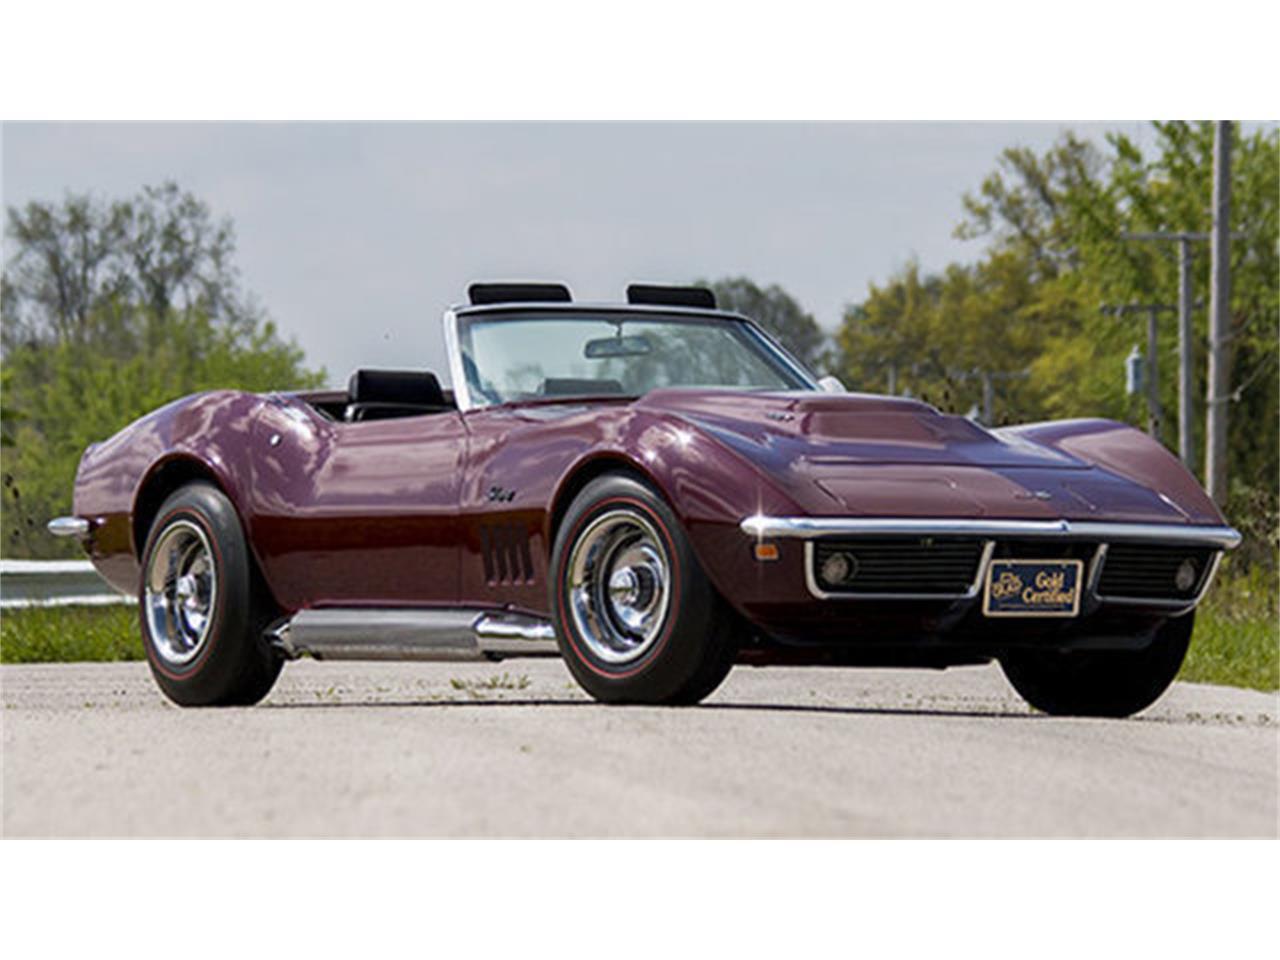 Large Picture of Classic '69 Chevrolet Corvette located in Connecticut Auction Vehicle - LHVA